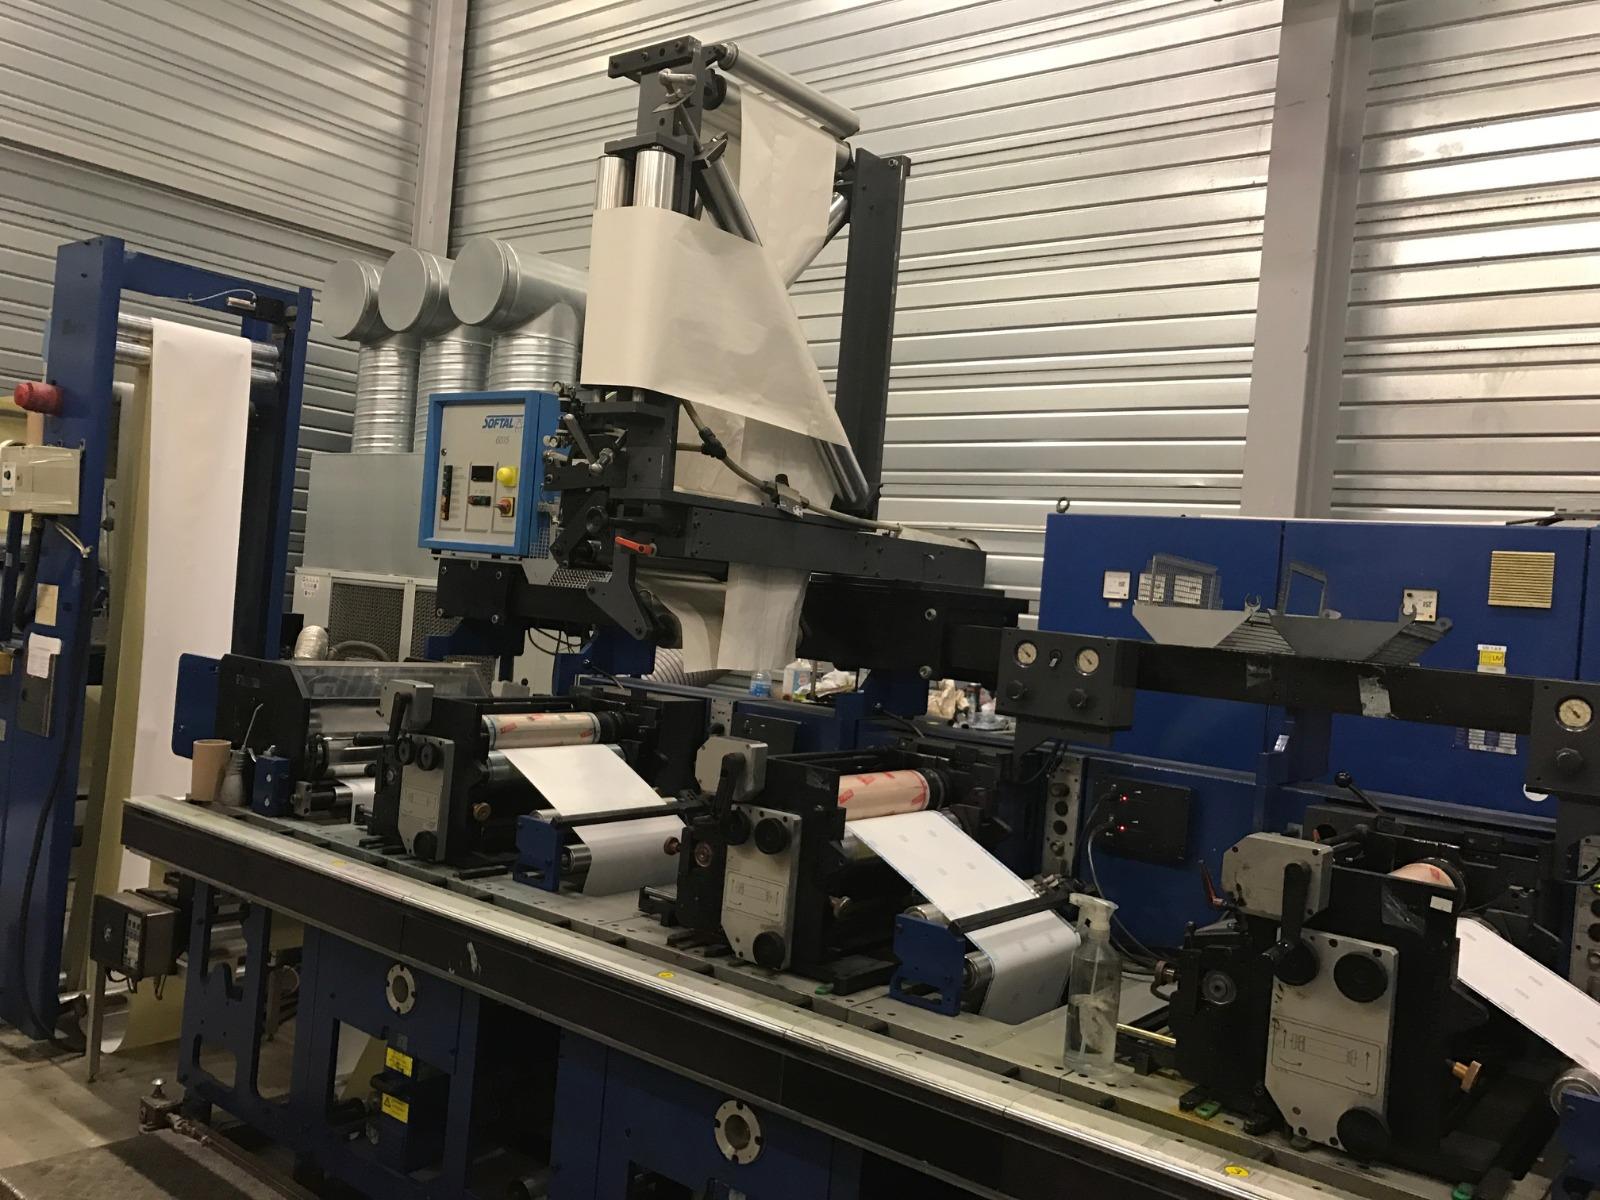 Gallus EM410 - Used Flexo Printing Presses and Used Flexographic Equipment-7